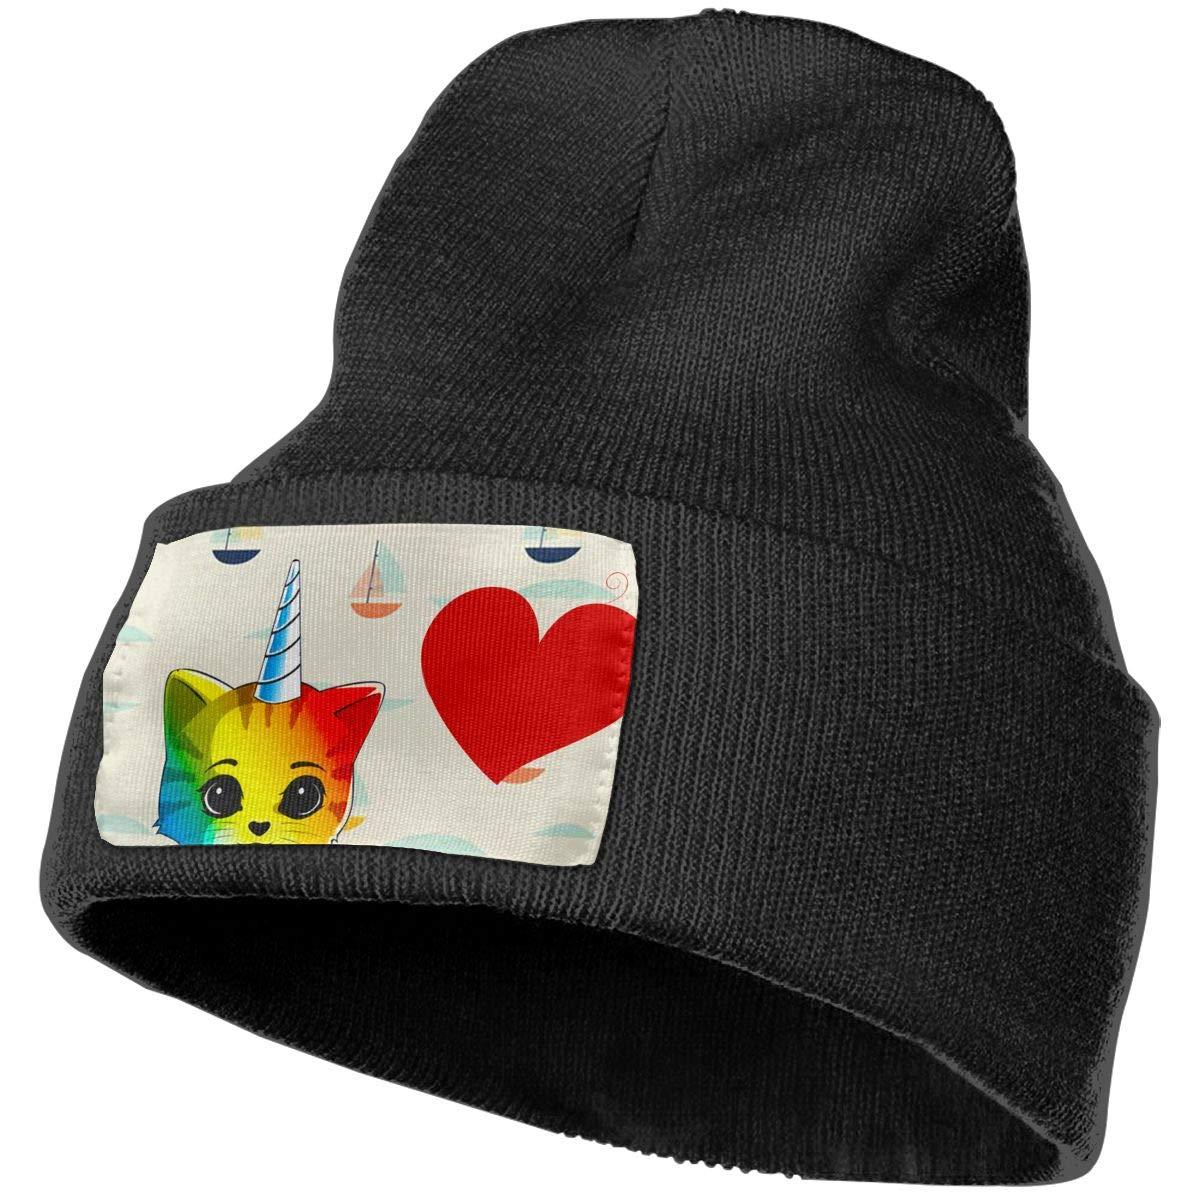 Horizon-t Loving Cats Unisex 100/% Acrylic Knitting Hat Cap Fashion Beanie Hat